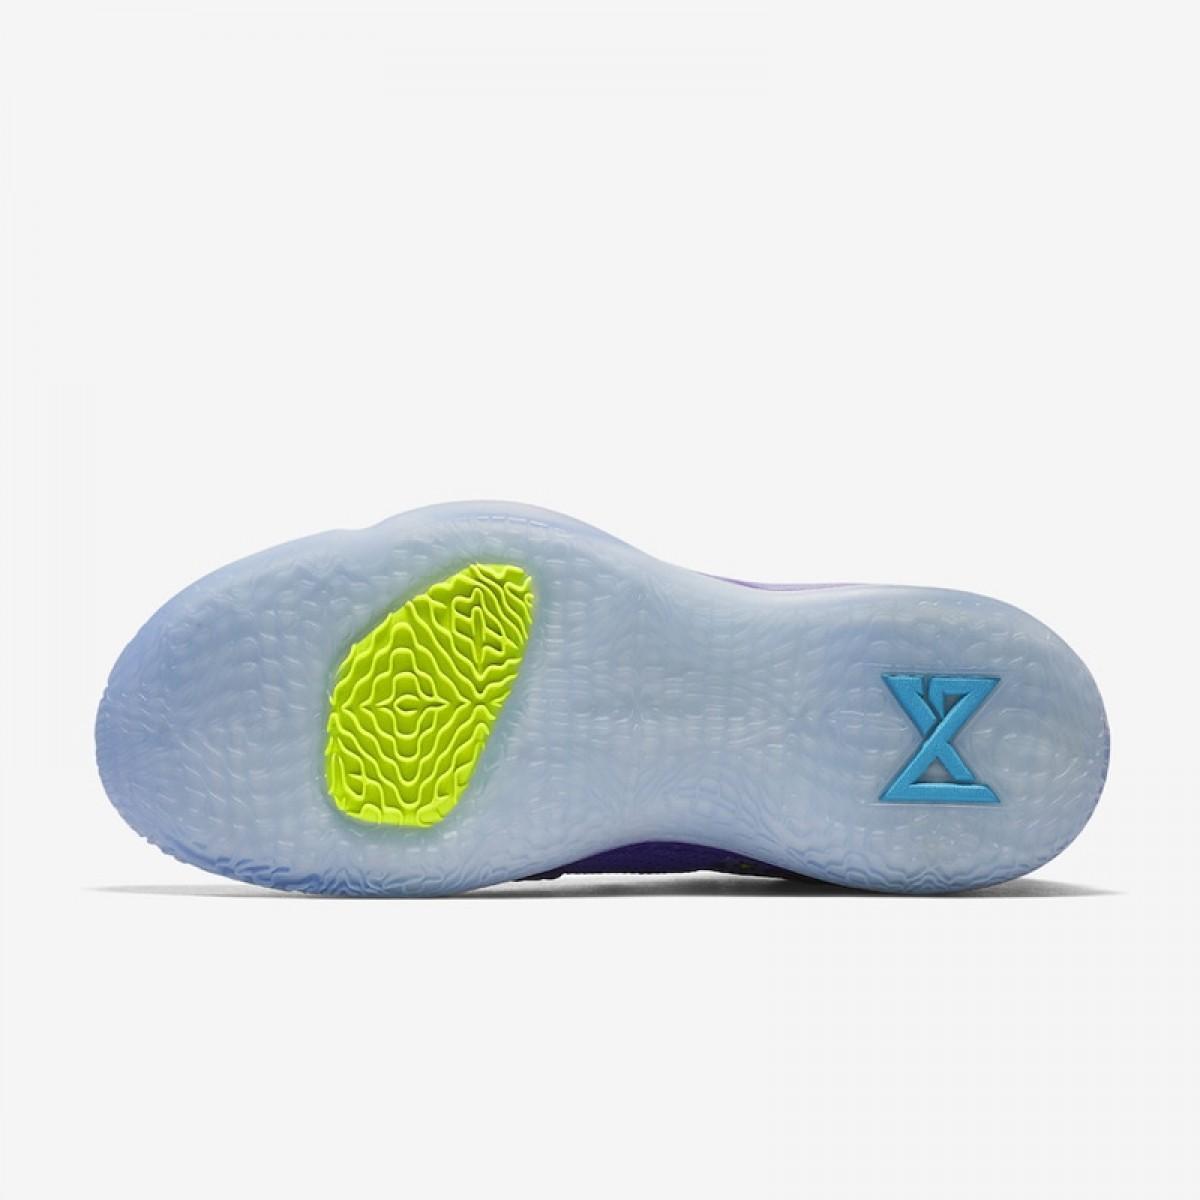 Nike PG2 'Mamba Mentality' AO2986-001